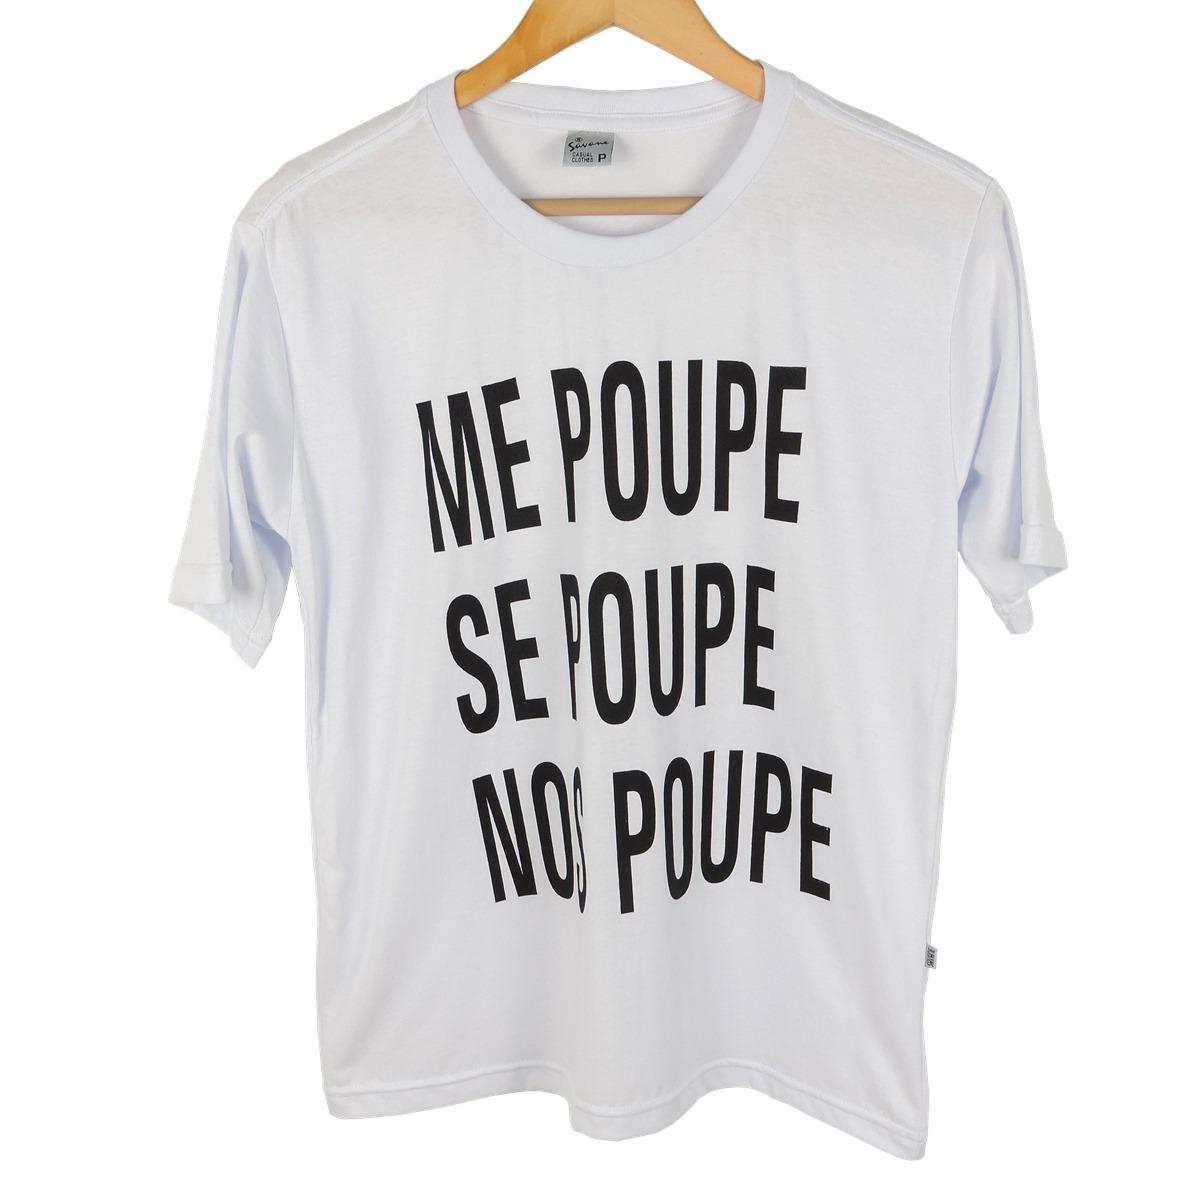 159377b88b blusa camiseta tshirt feminina frases me poupe manga curta. Carregando zoom.